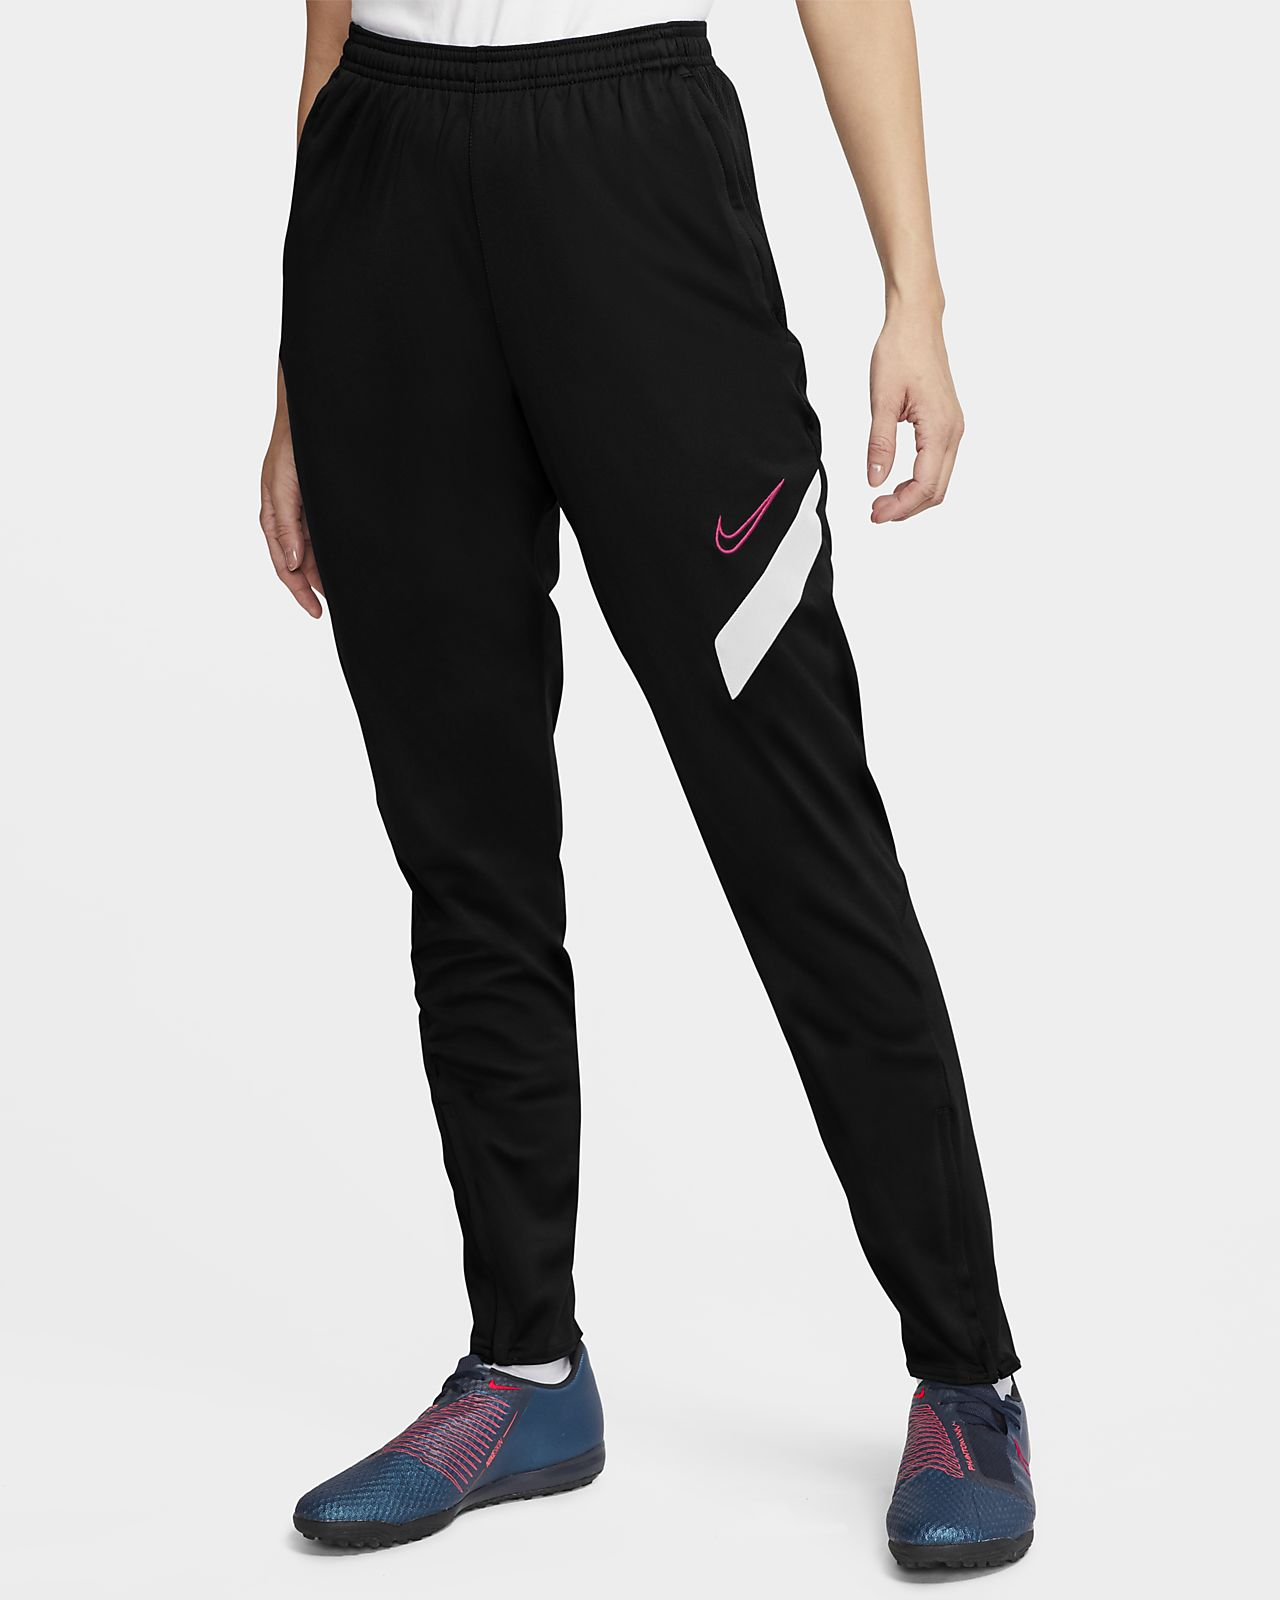 Nike Dri-FIT Academy Pro fotballbukse til dame